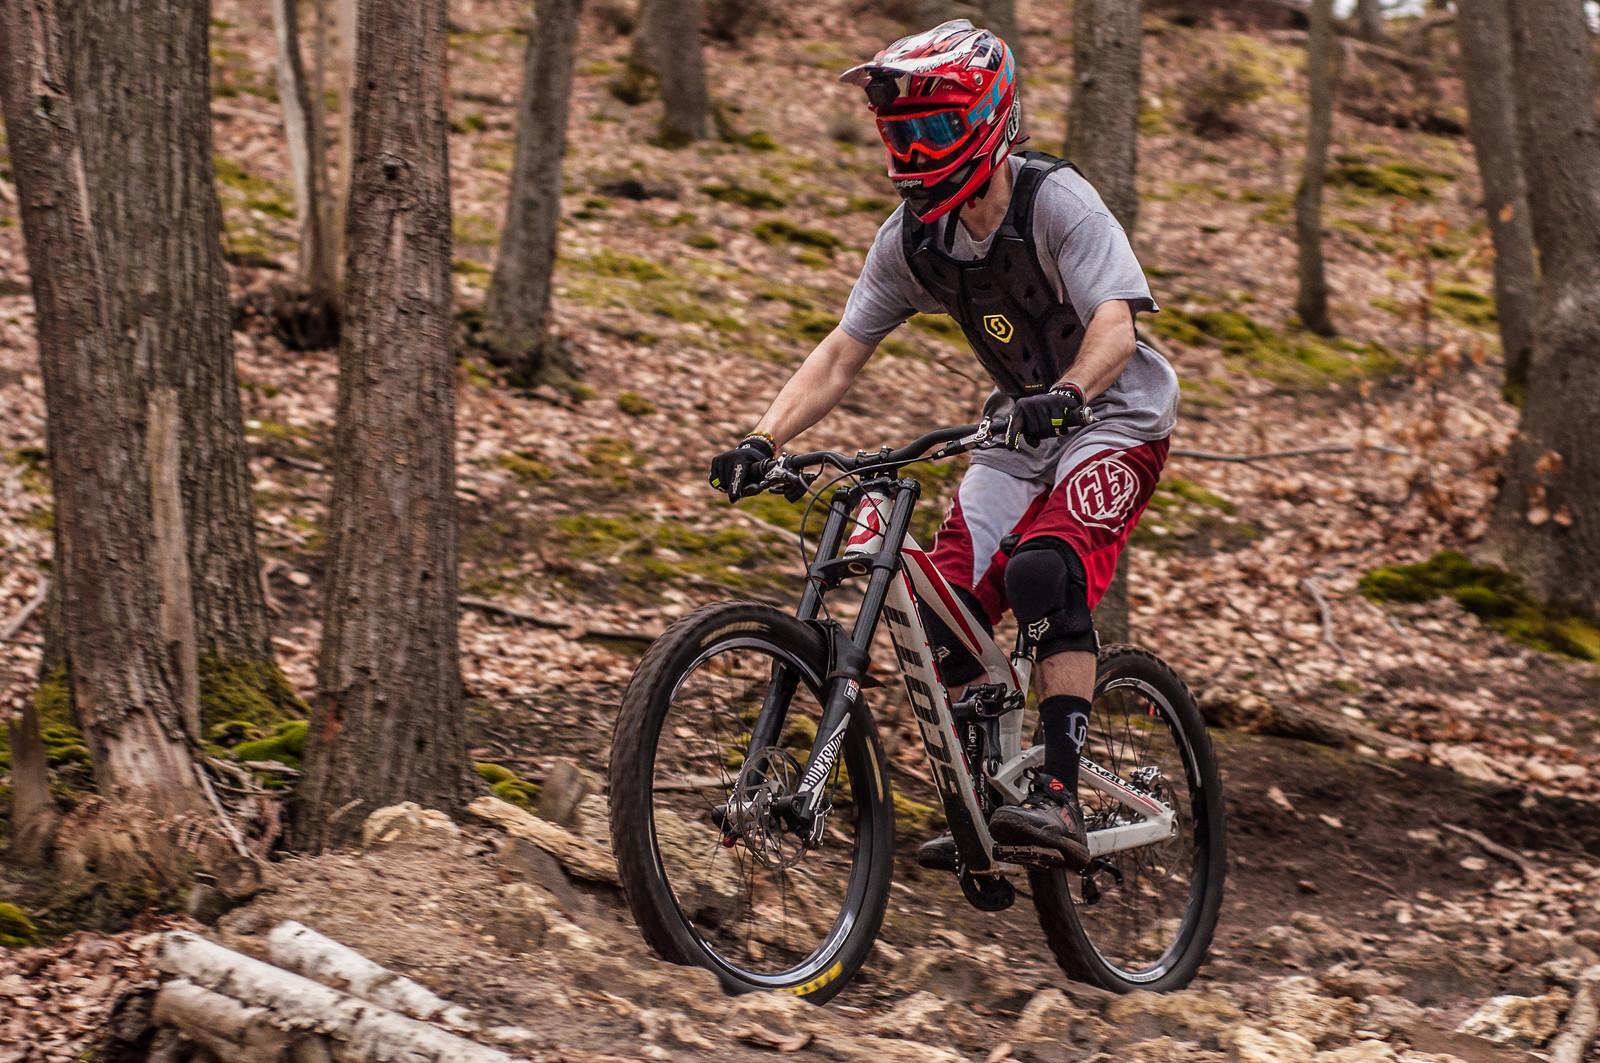 Rock garden - Romuald_Manach - Mountain Biking Pictures - Vital MTB